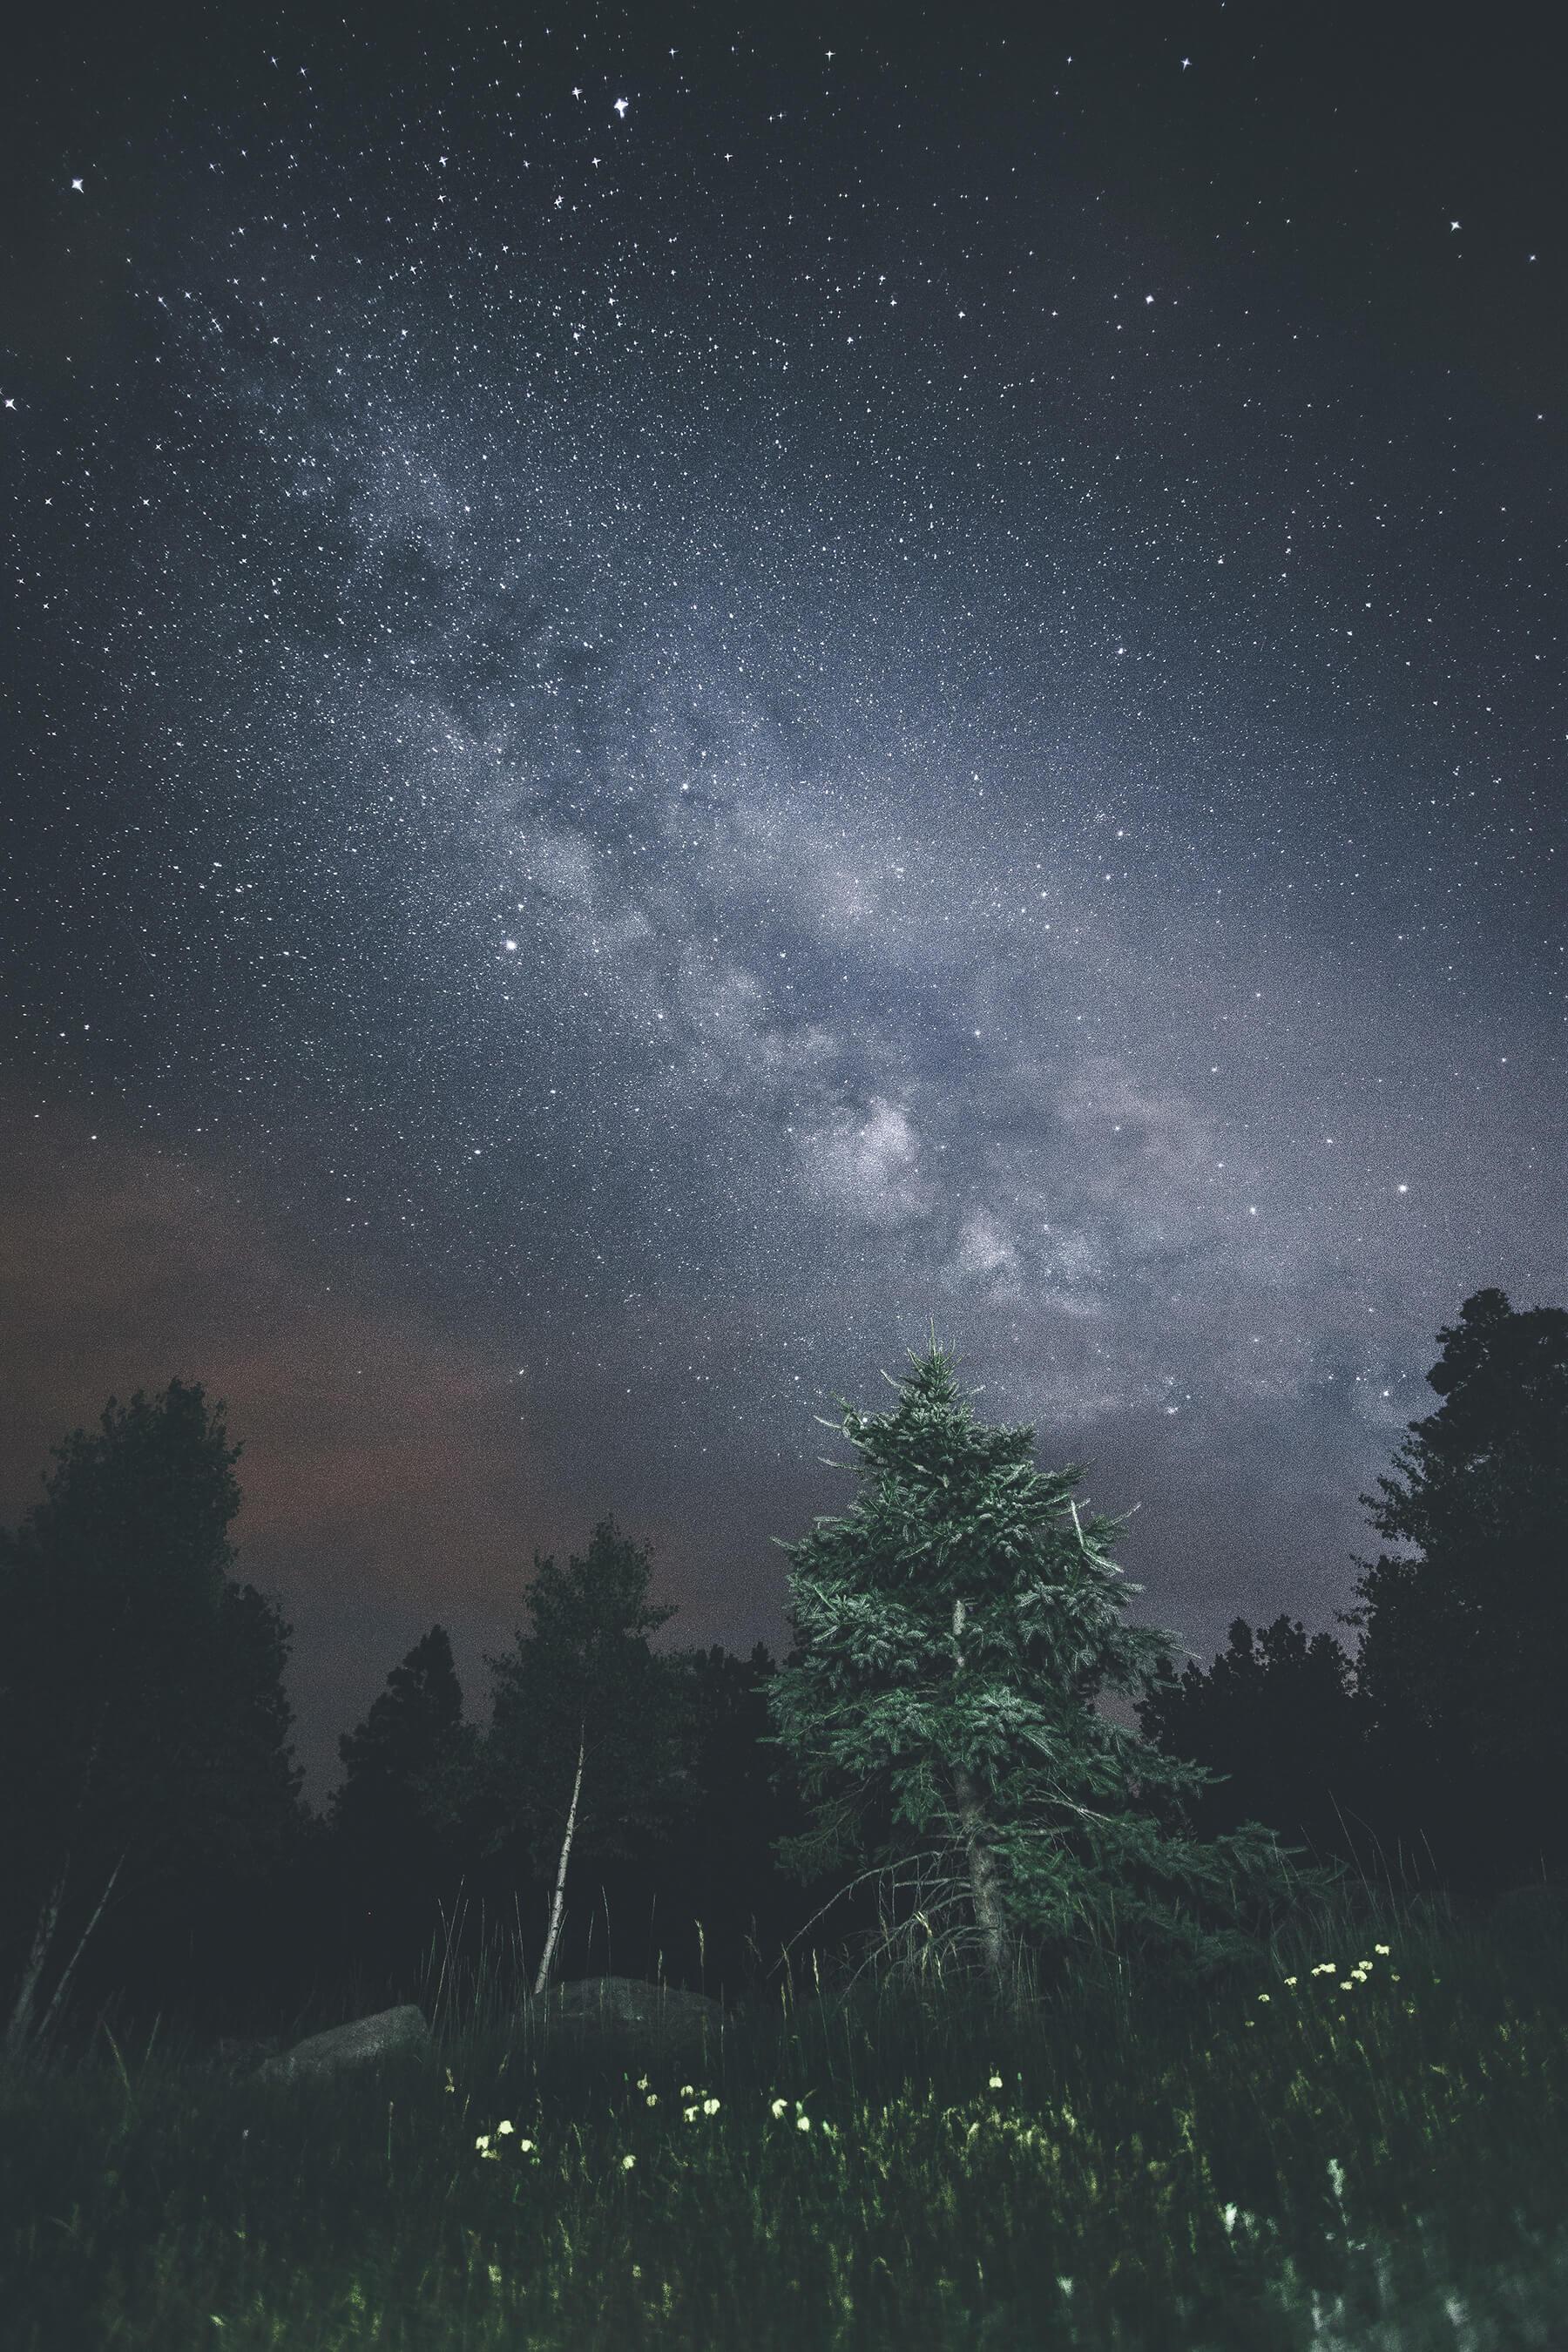 Outdoor lighting photography